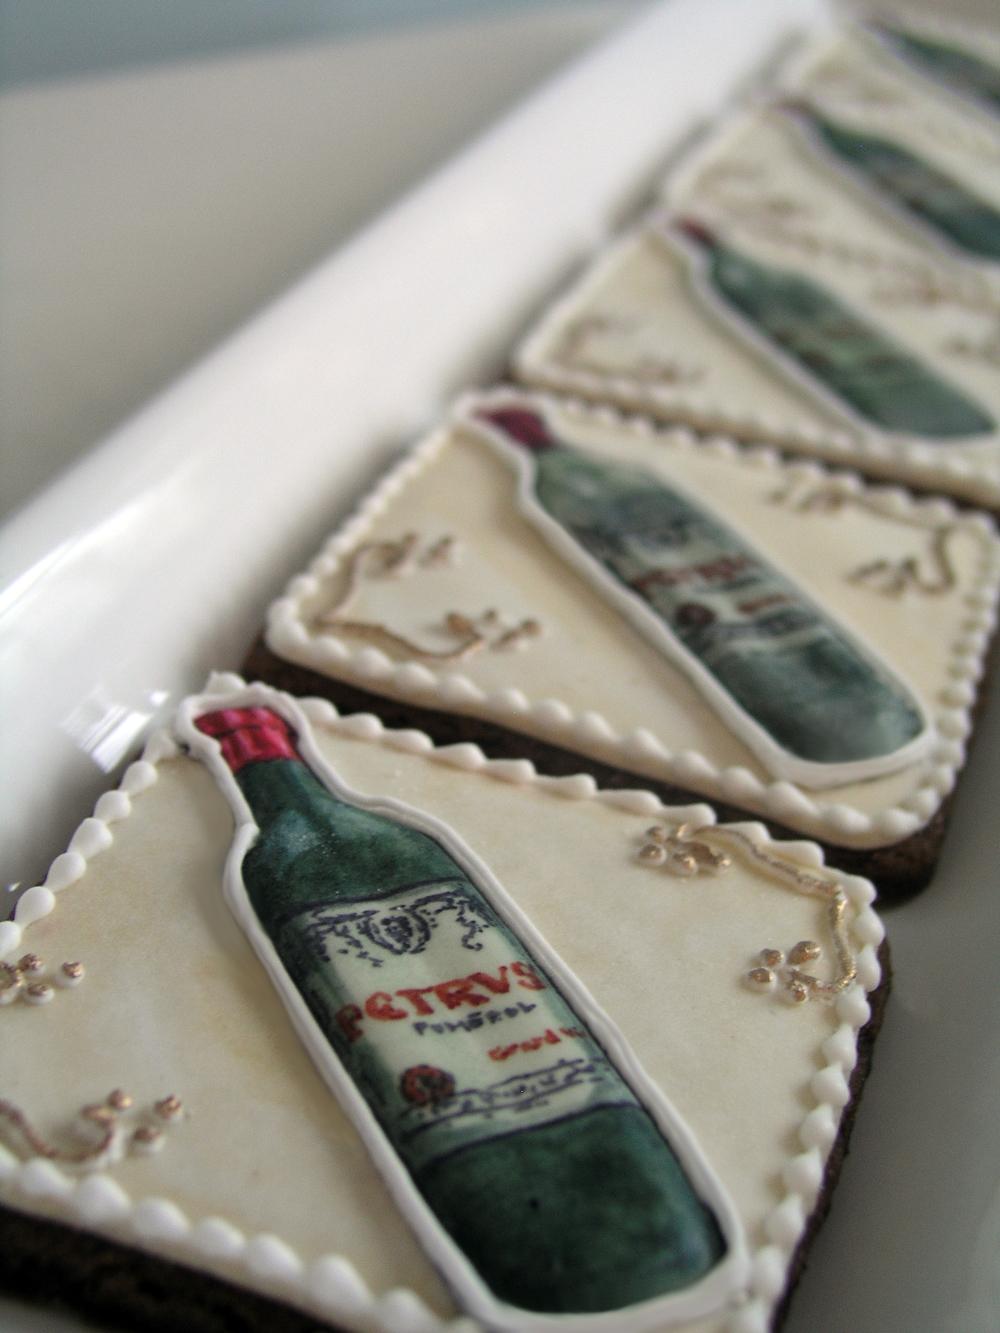 Petrus Wine Cookies